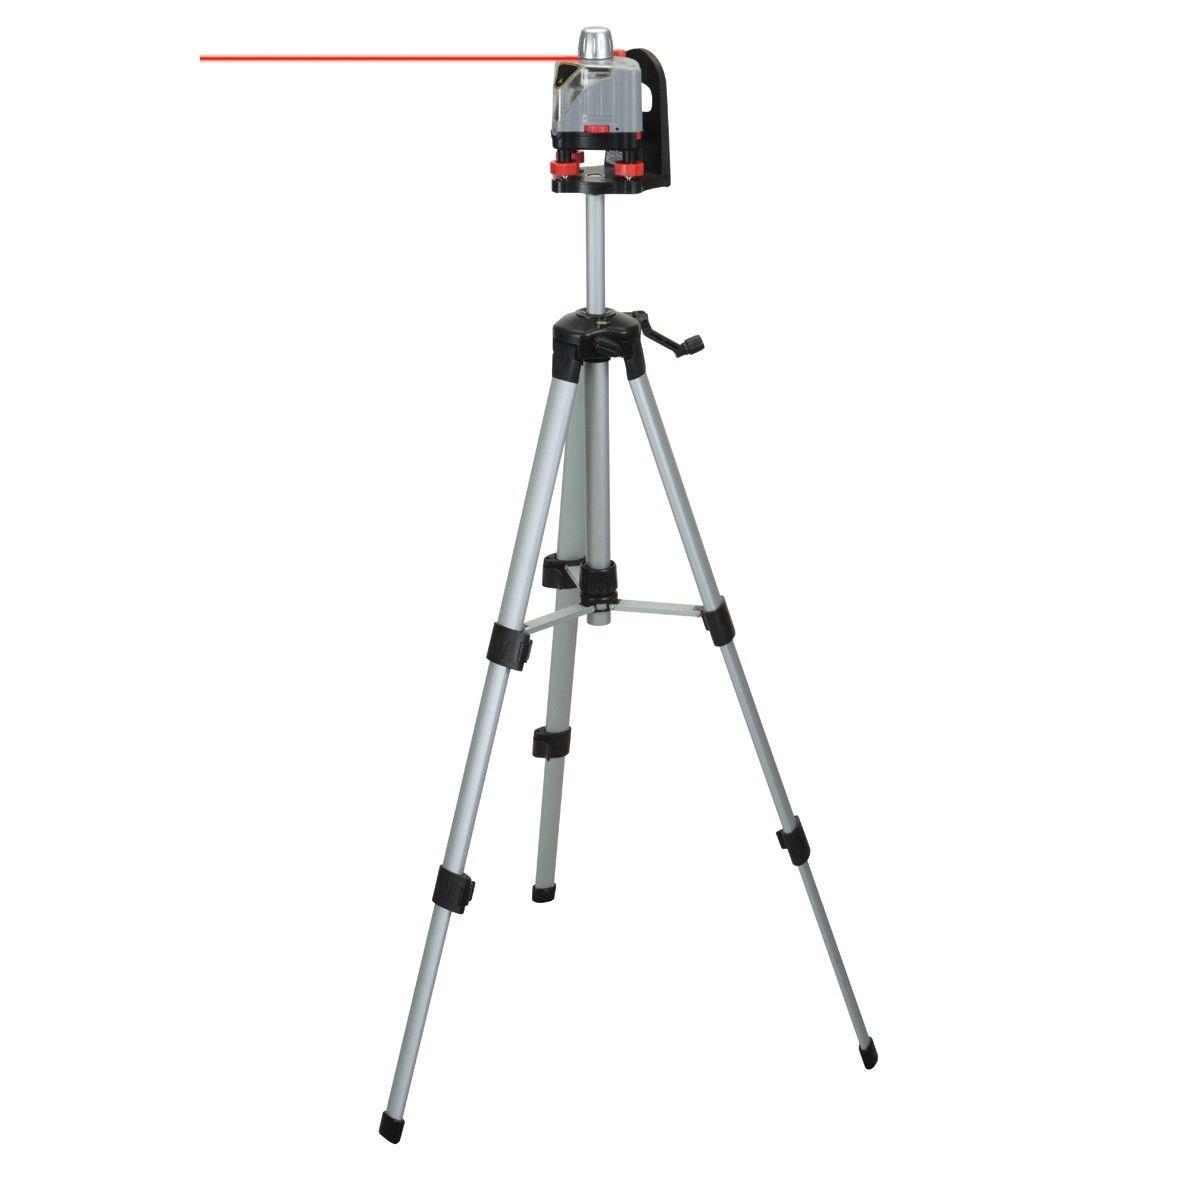 Motorized Rotary Laser Level Kit Laser Levels Tool Kit Workbench Designs